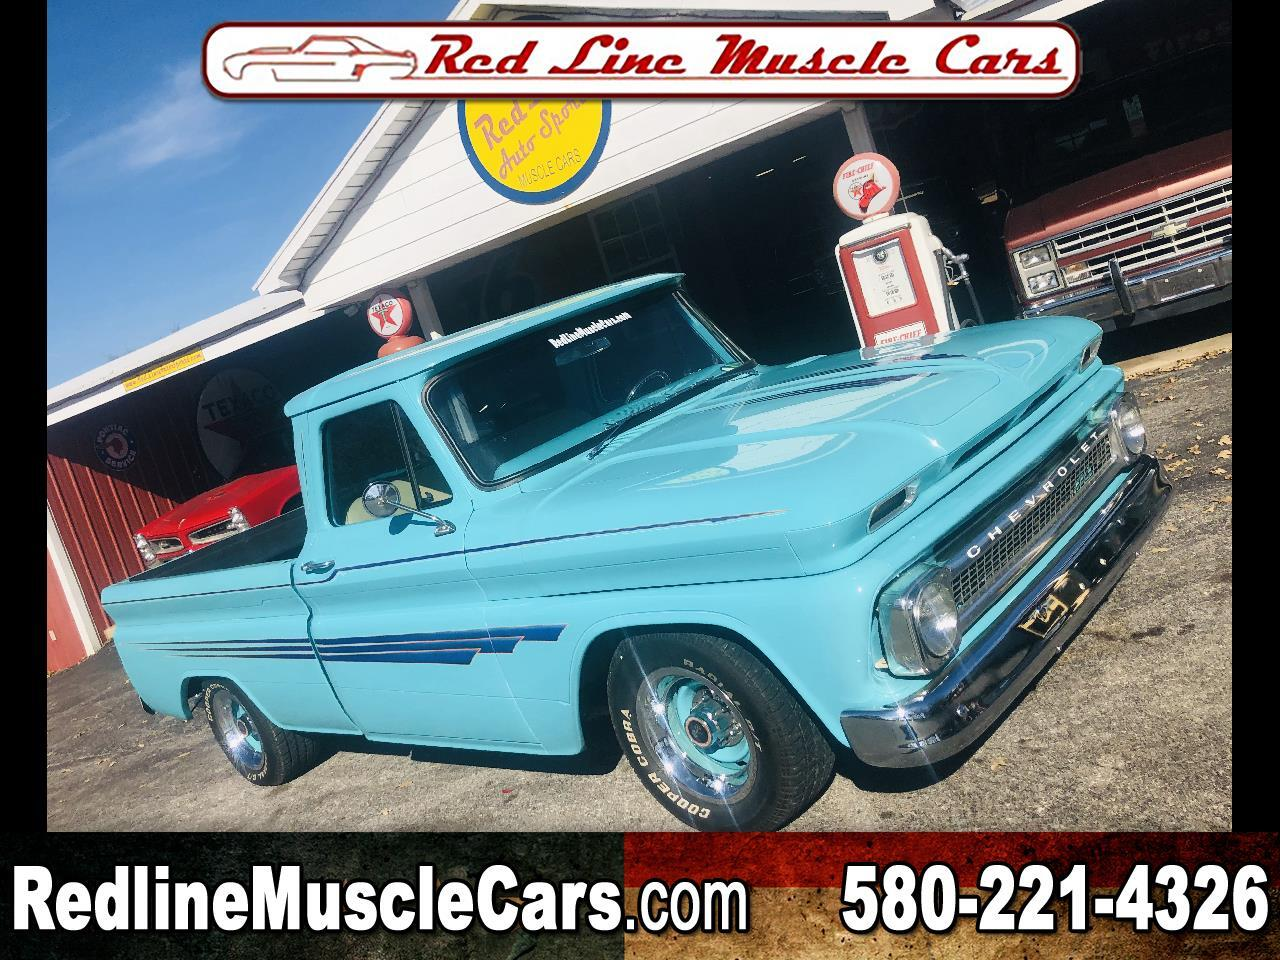 1964 Chevrolet Custom CUSTOM 10 C10 SWB BIG BACK WINDOW